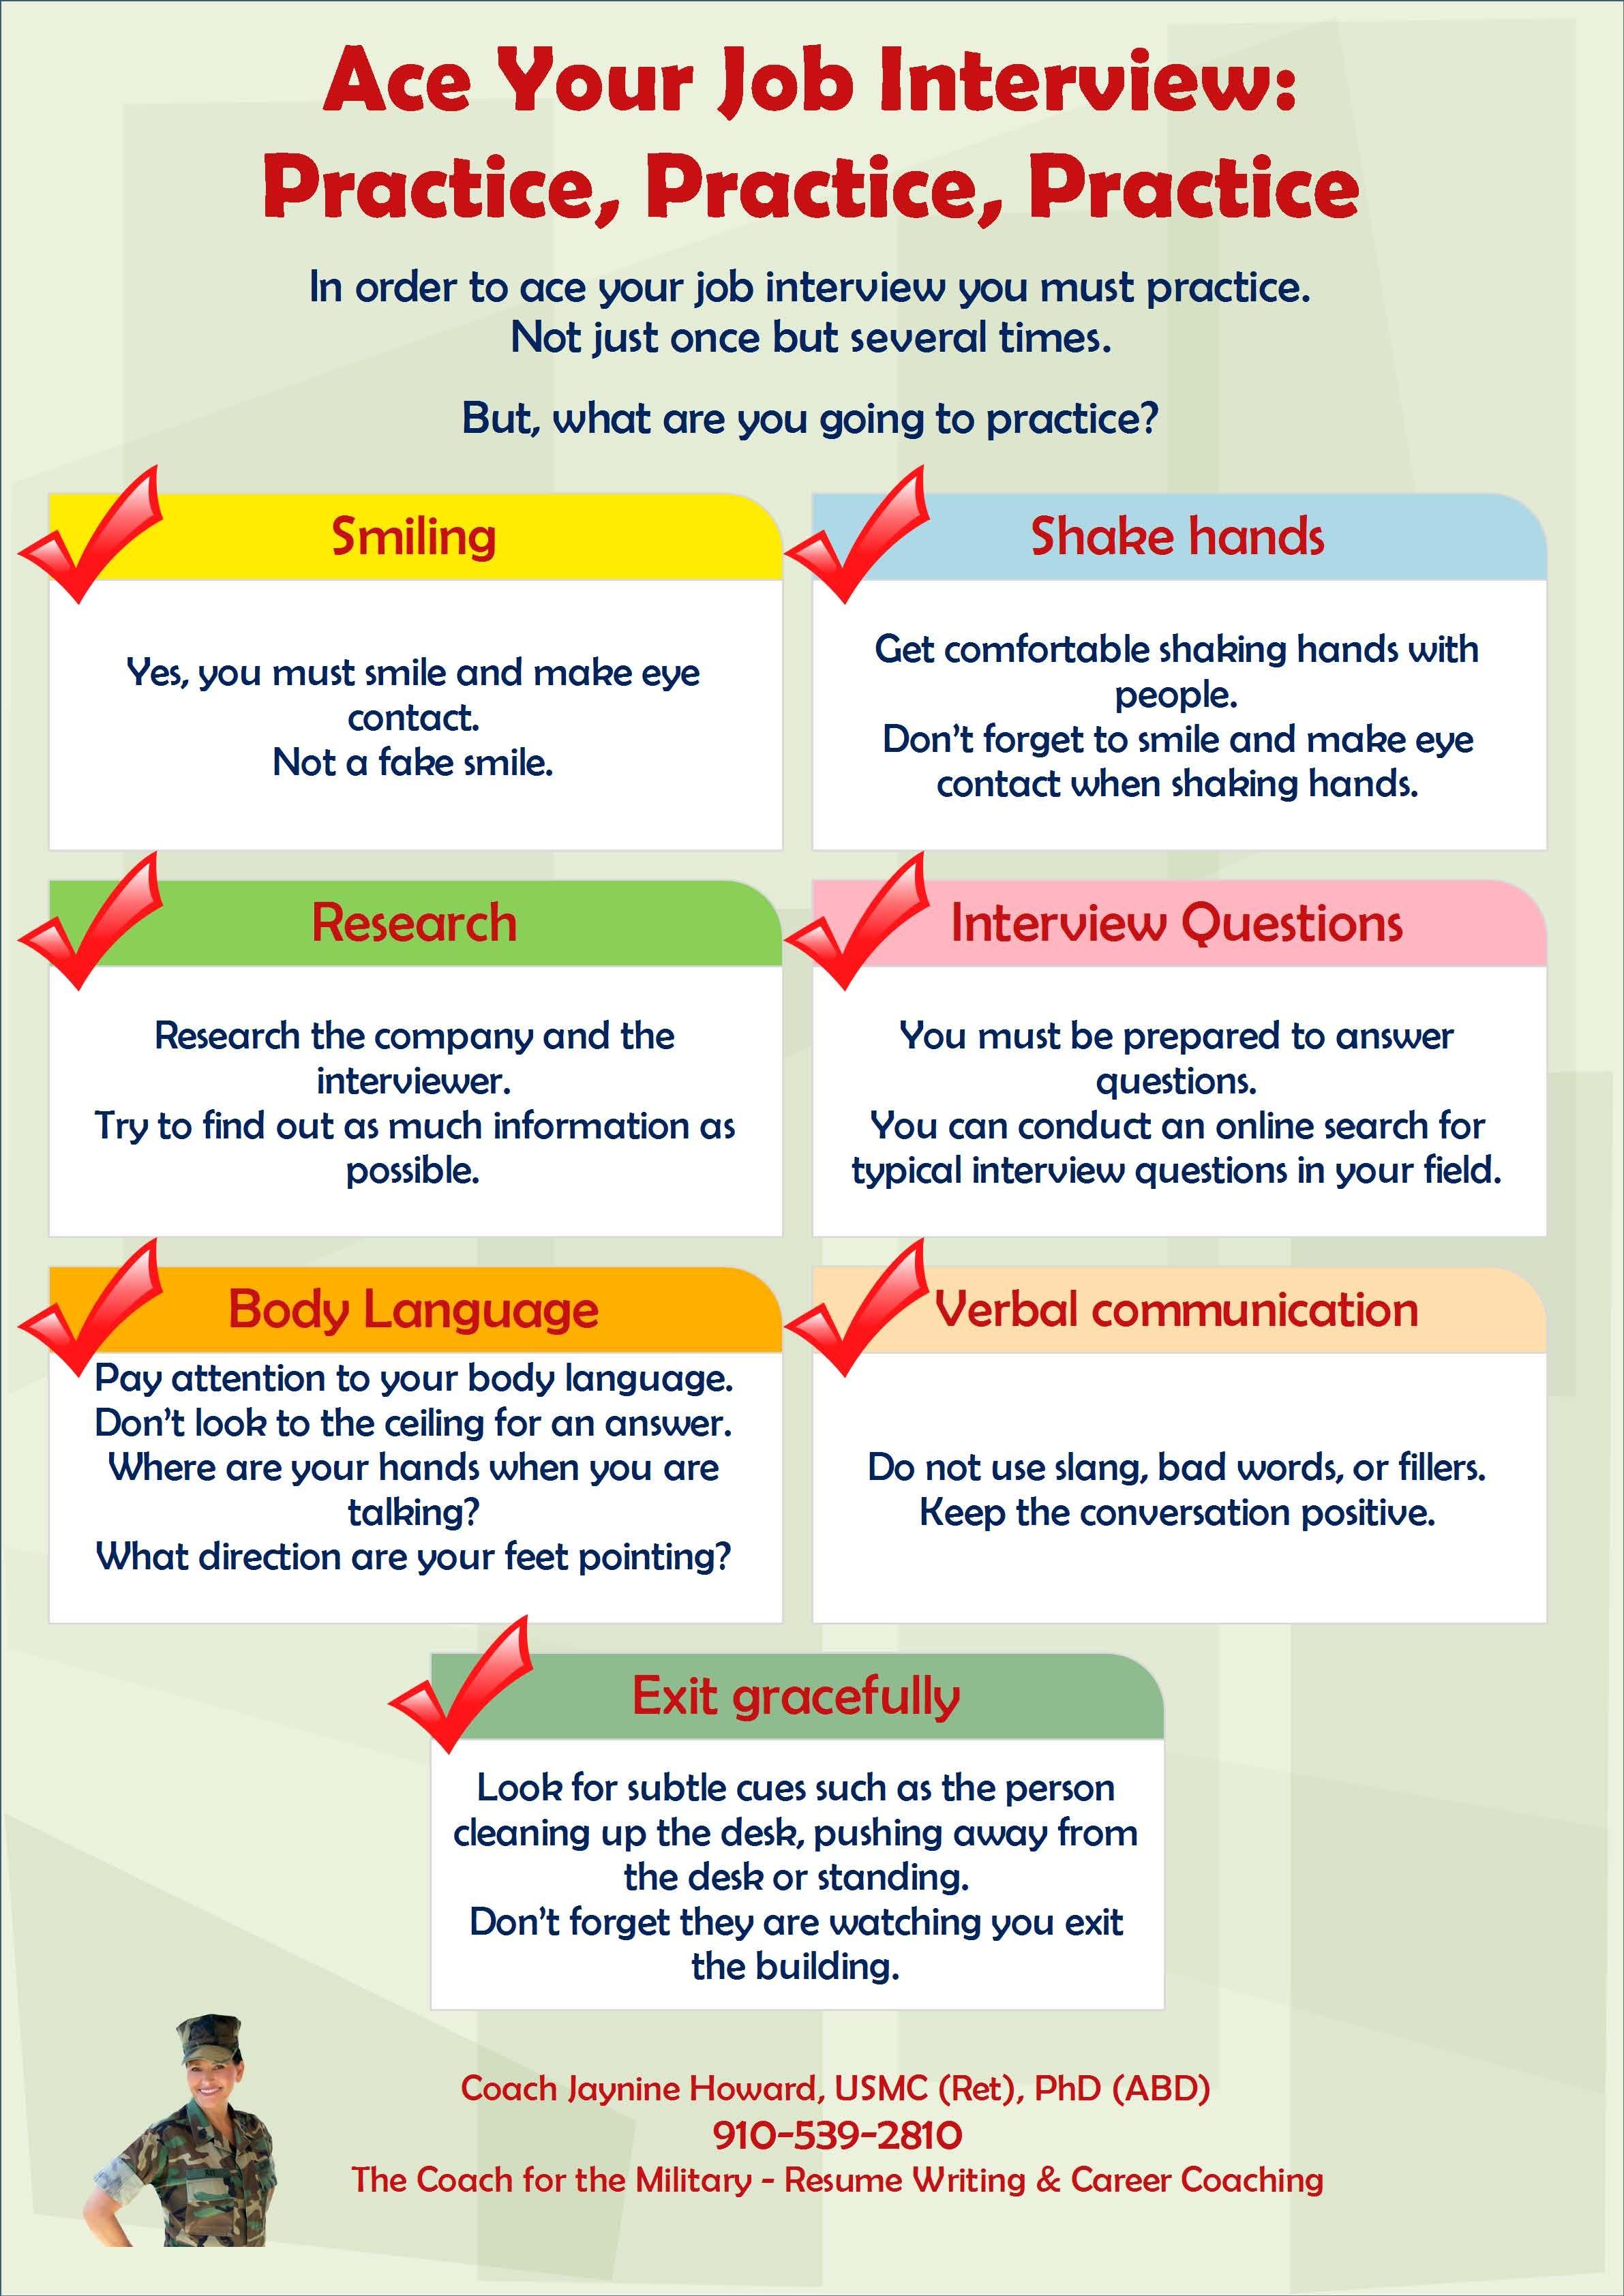 Practice Practice Practice To Ace Your Job Interview Job Interview Job Interview Tips Job Interview Preparation Job Interview Questions